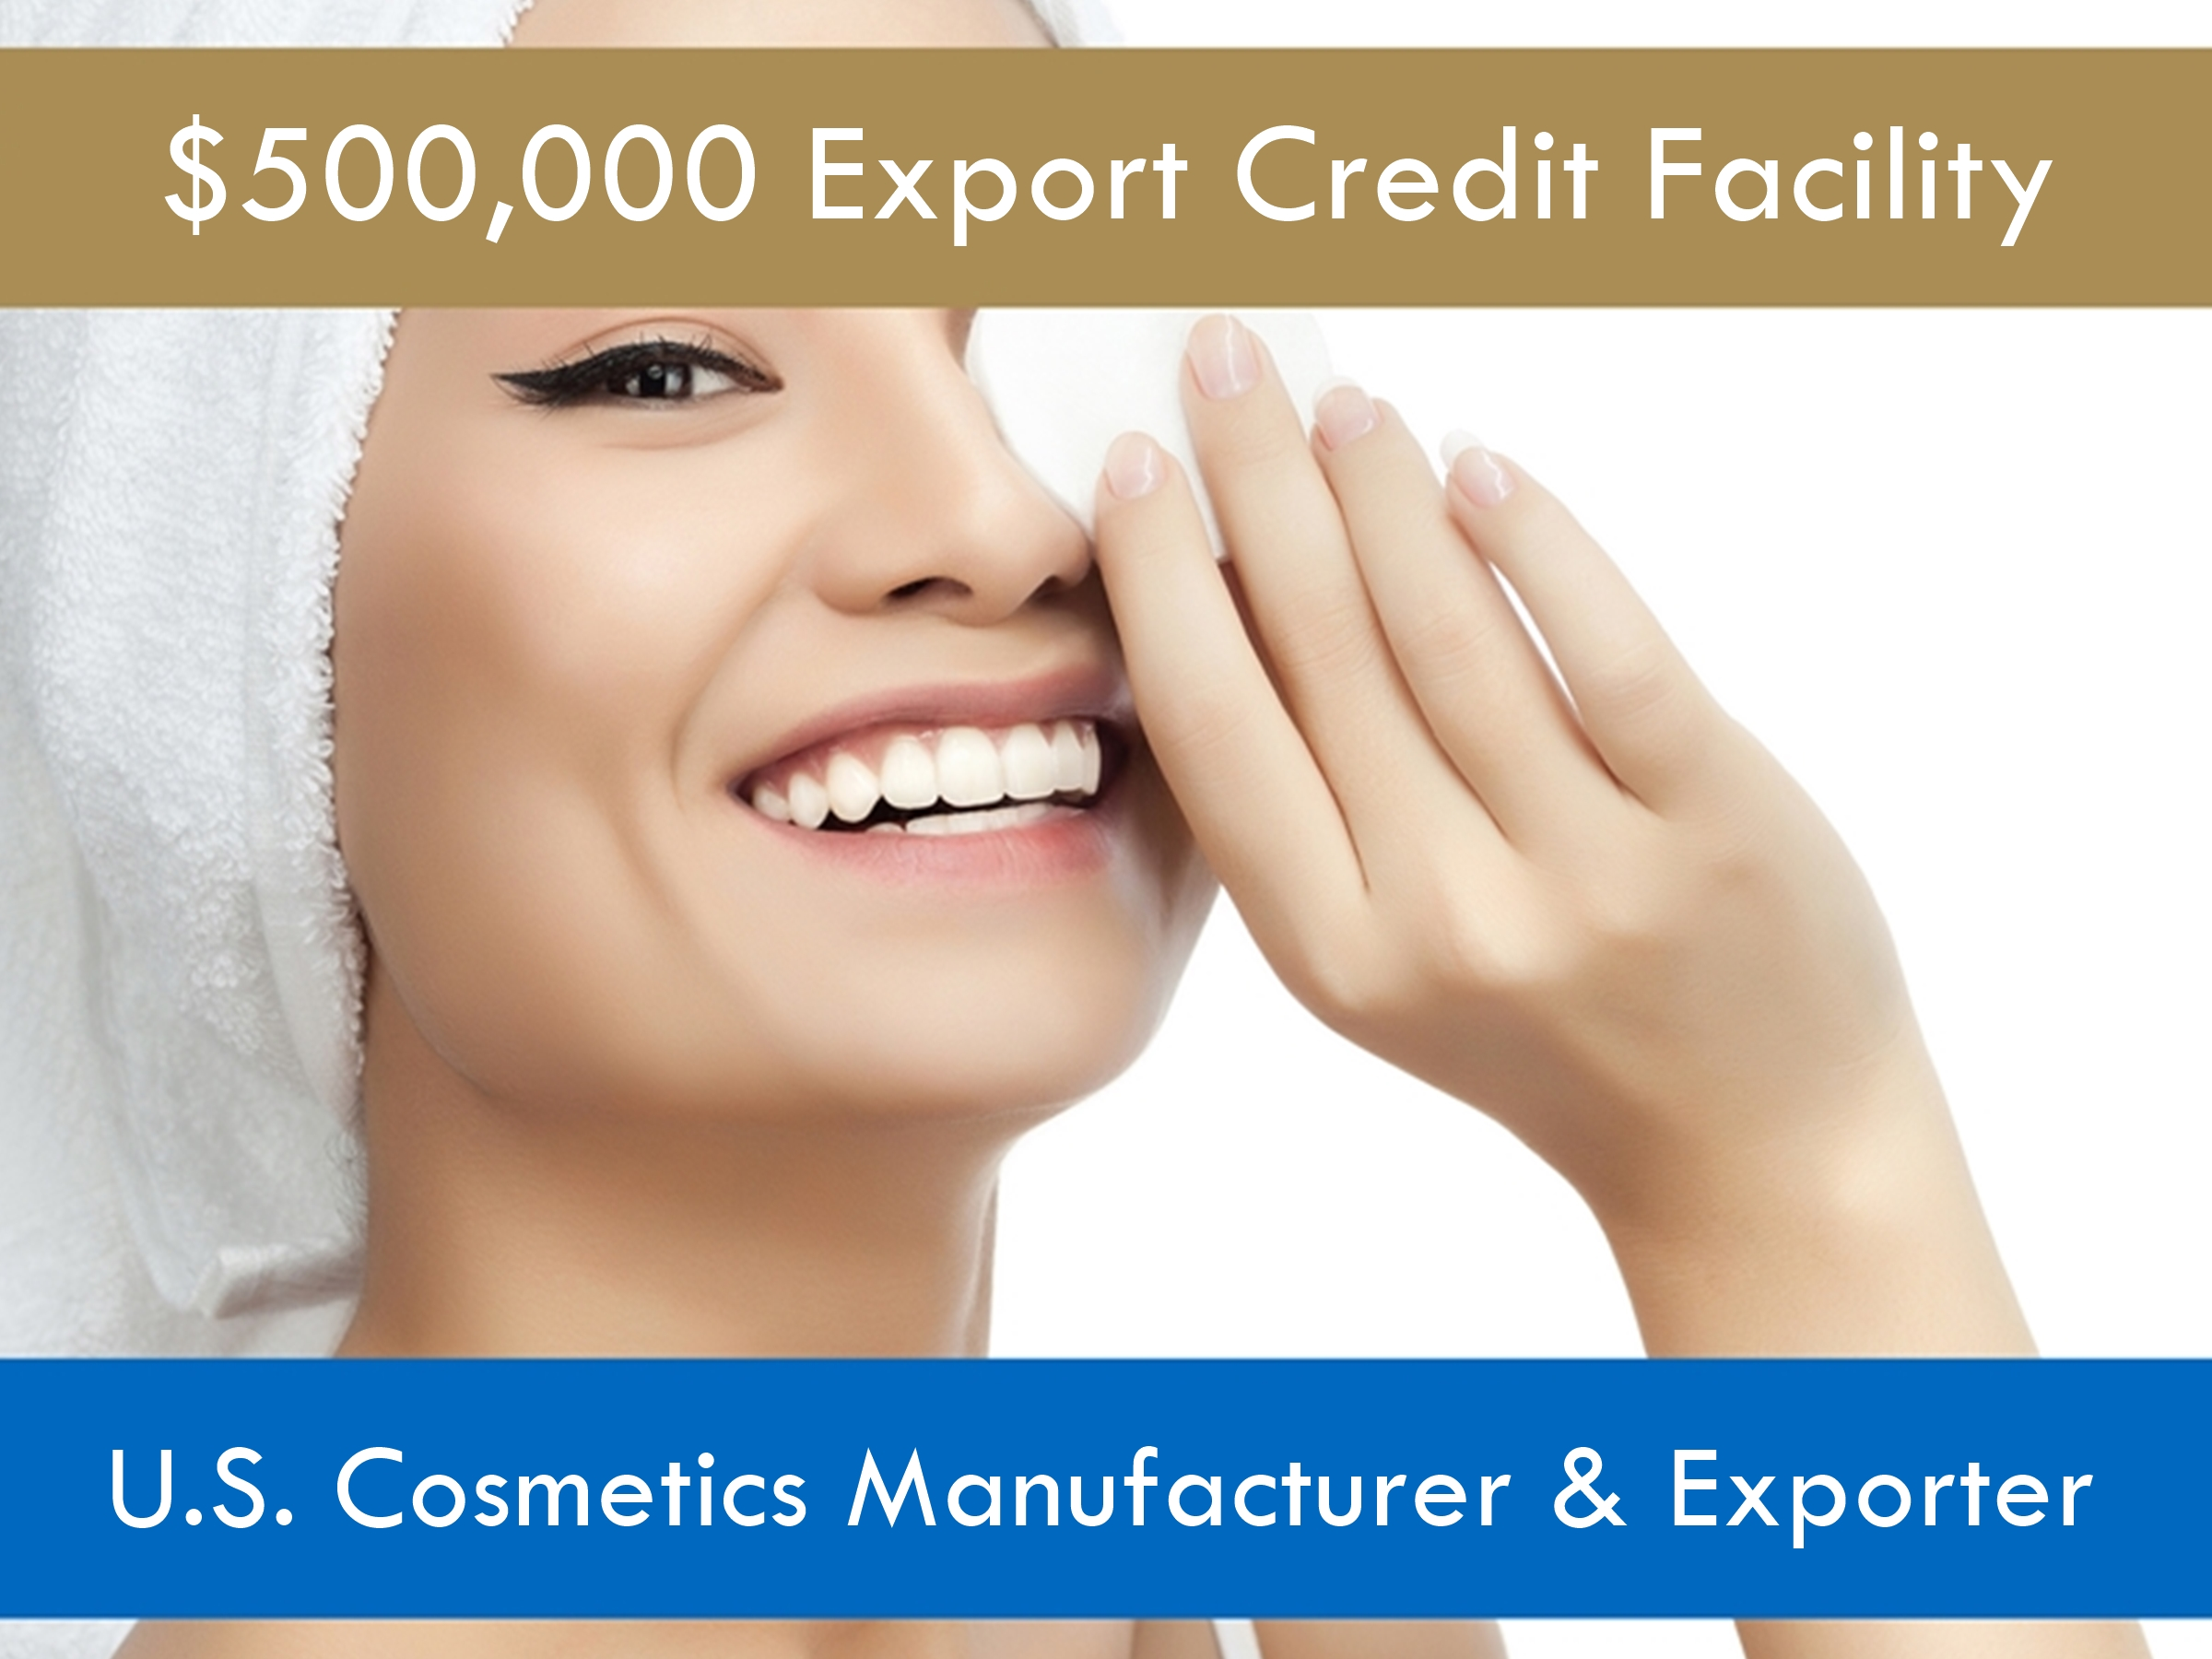 Cosmetics Manufacturer Exporter